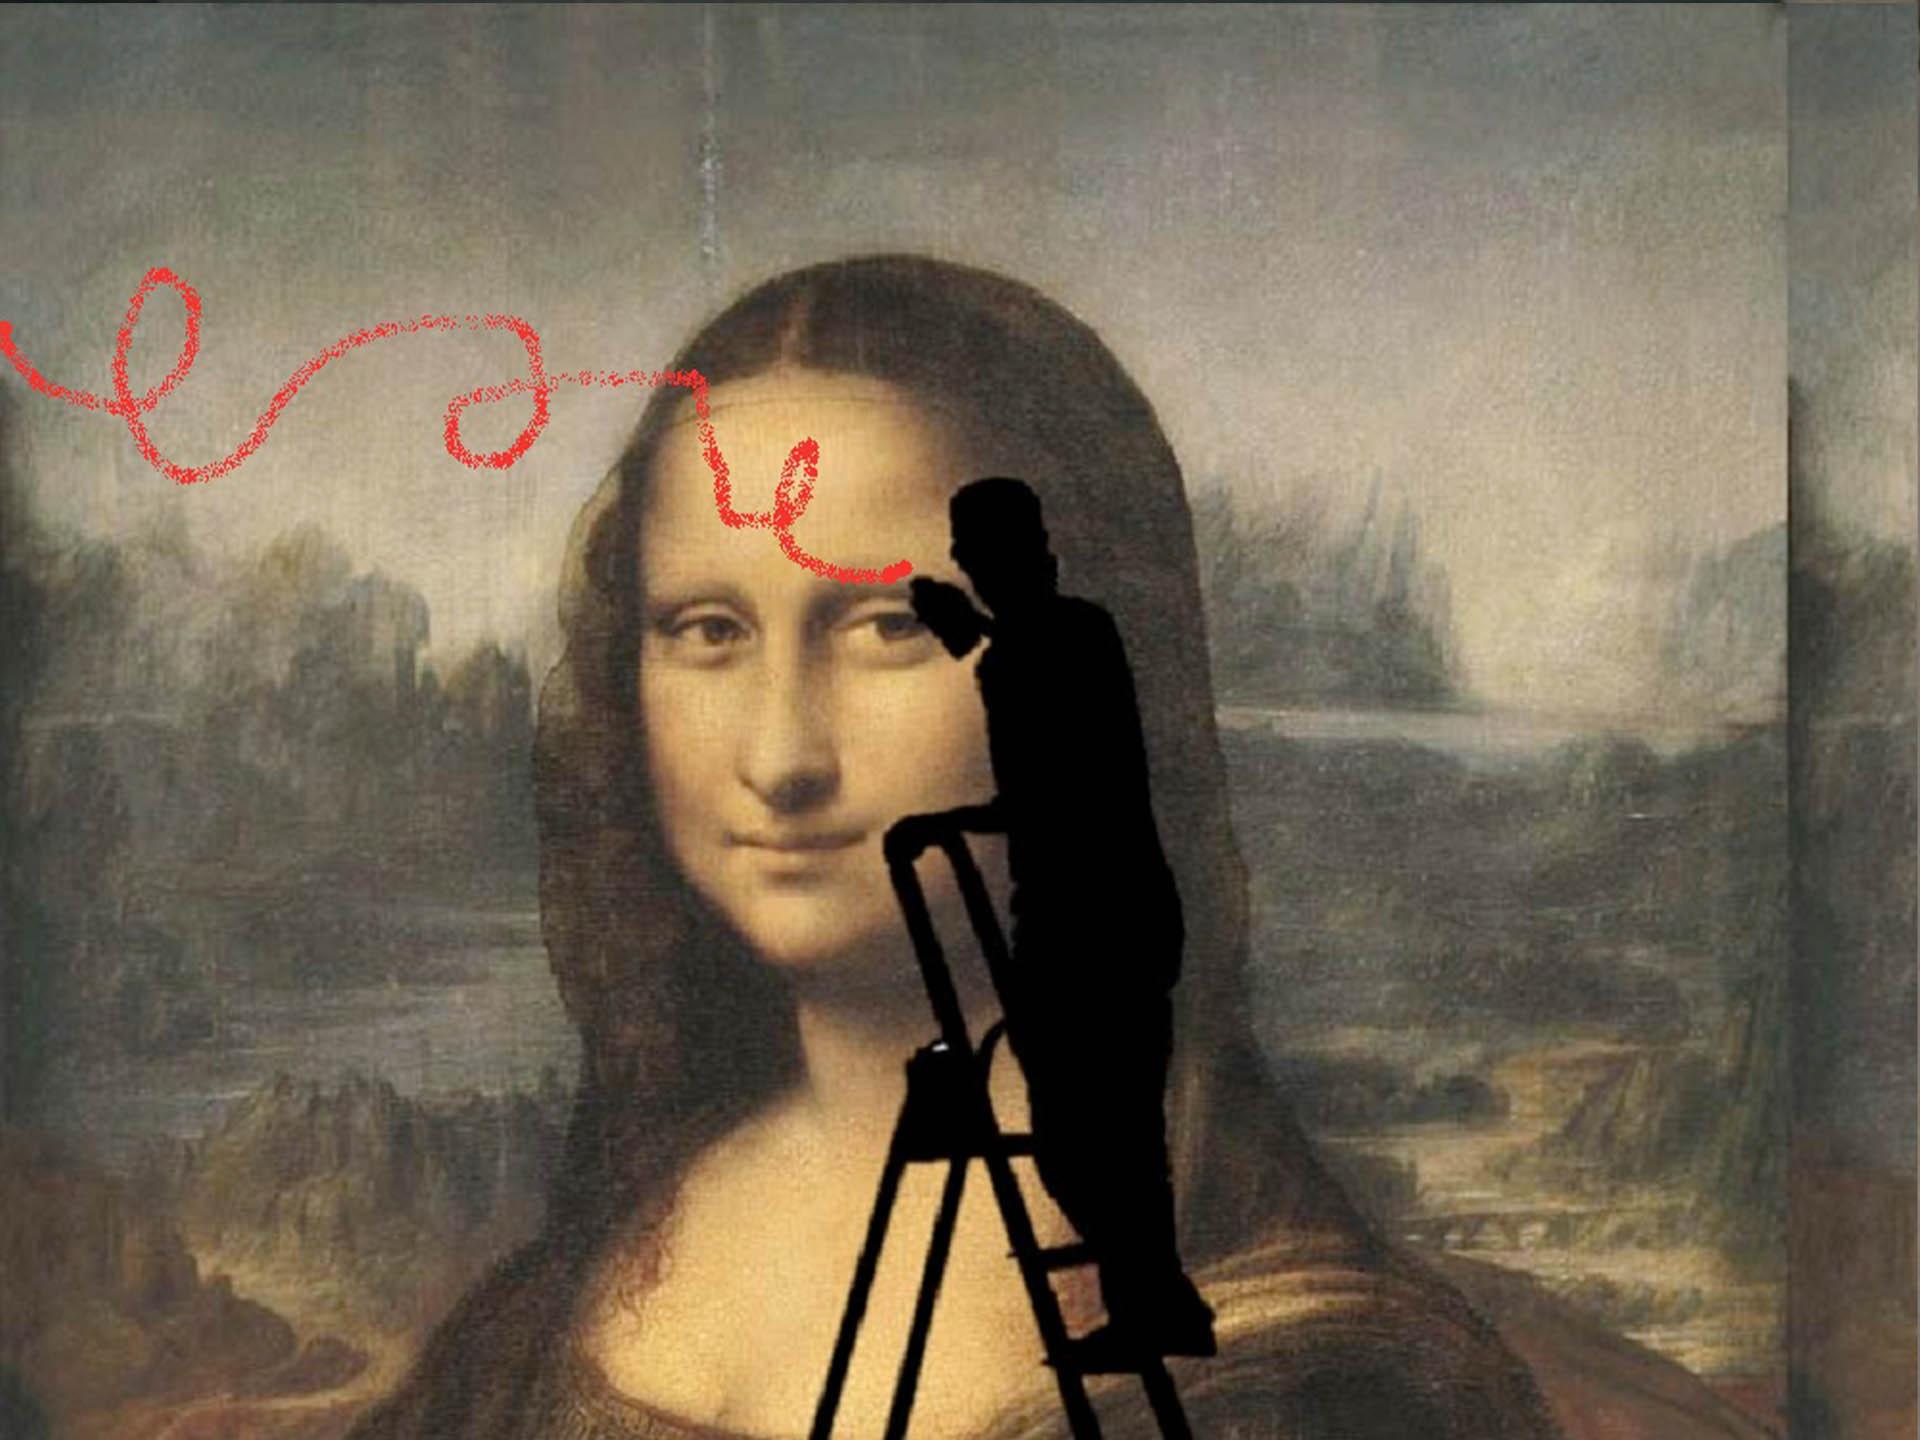 Monalisa: arte sob ataque